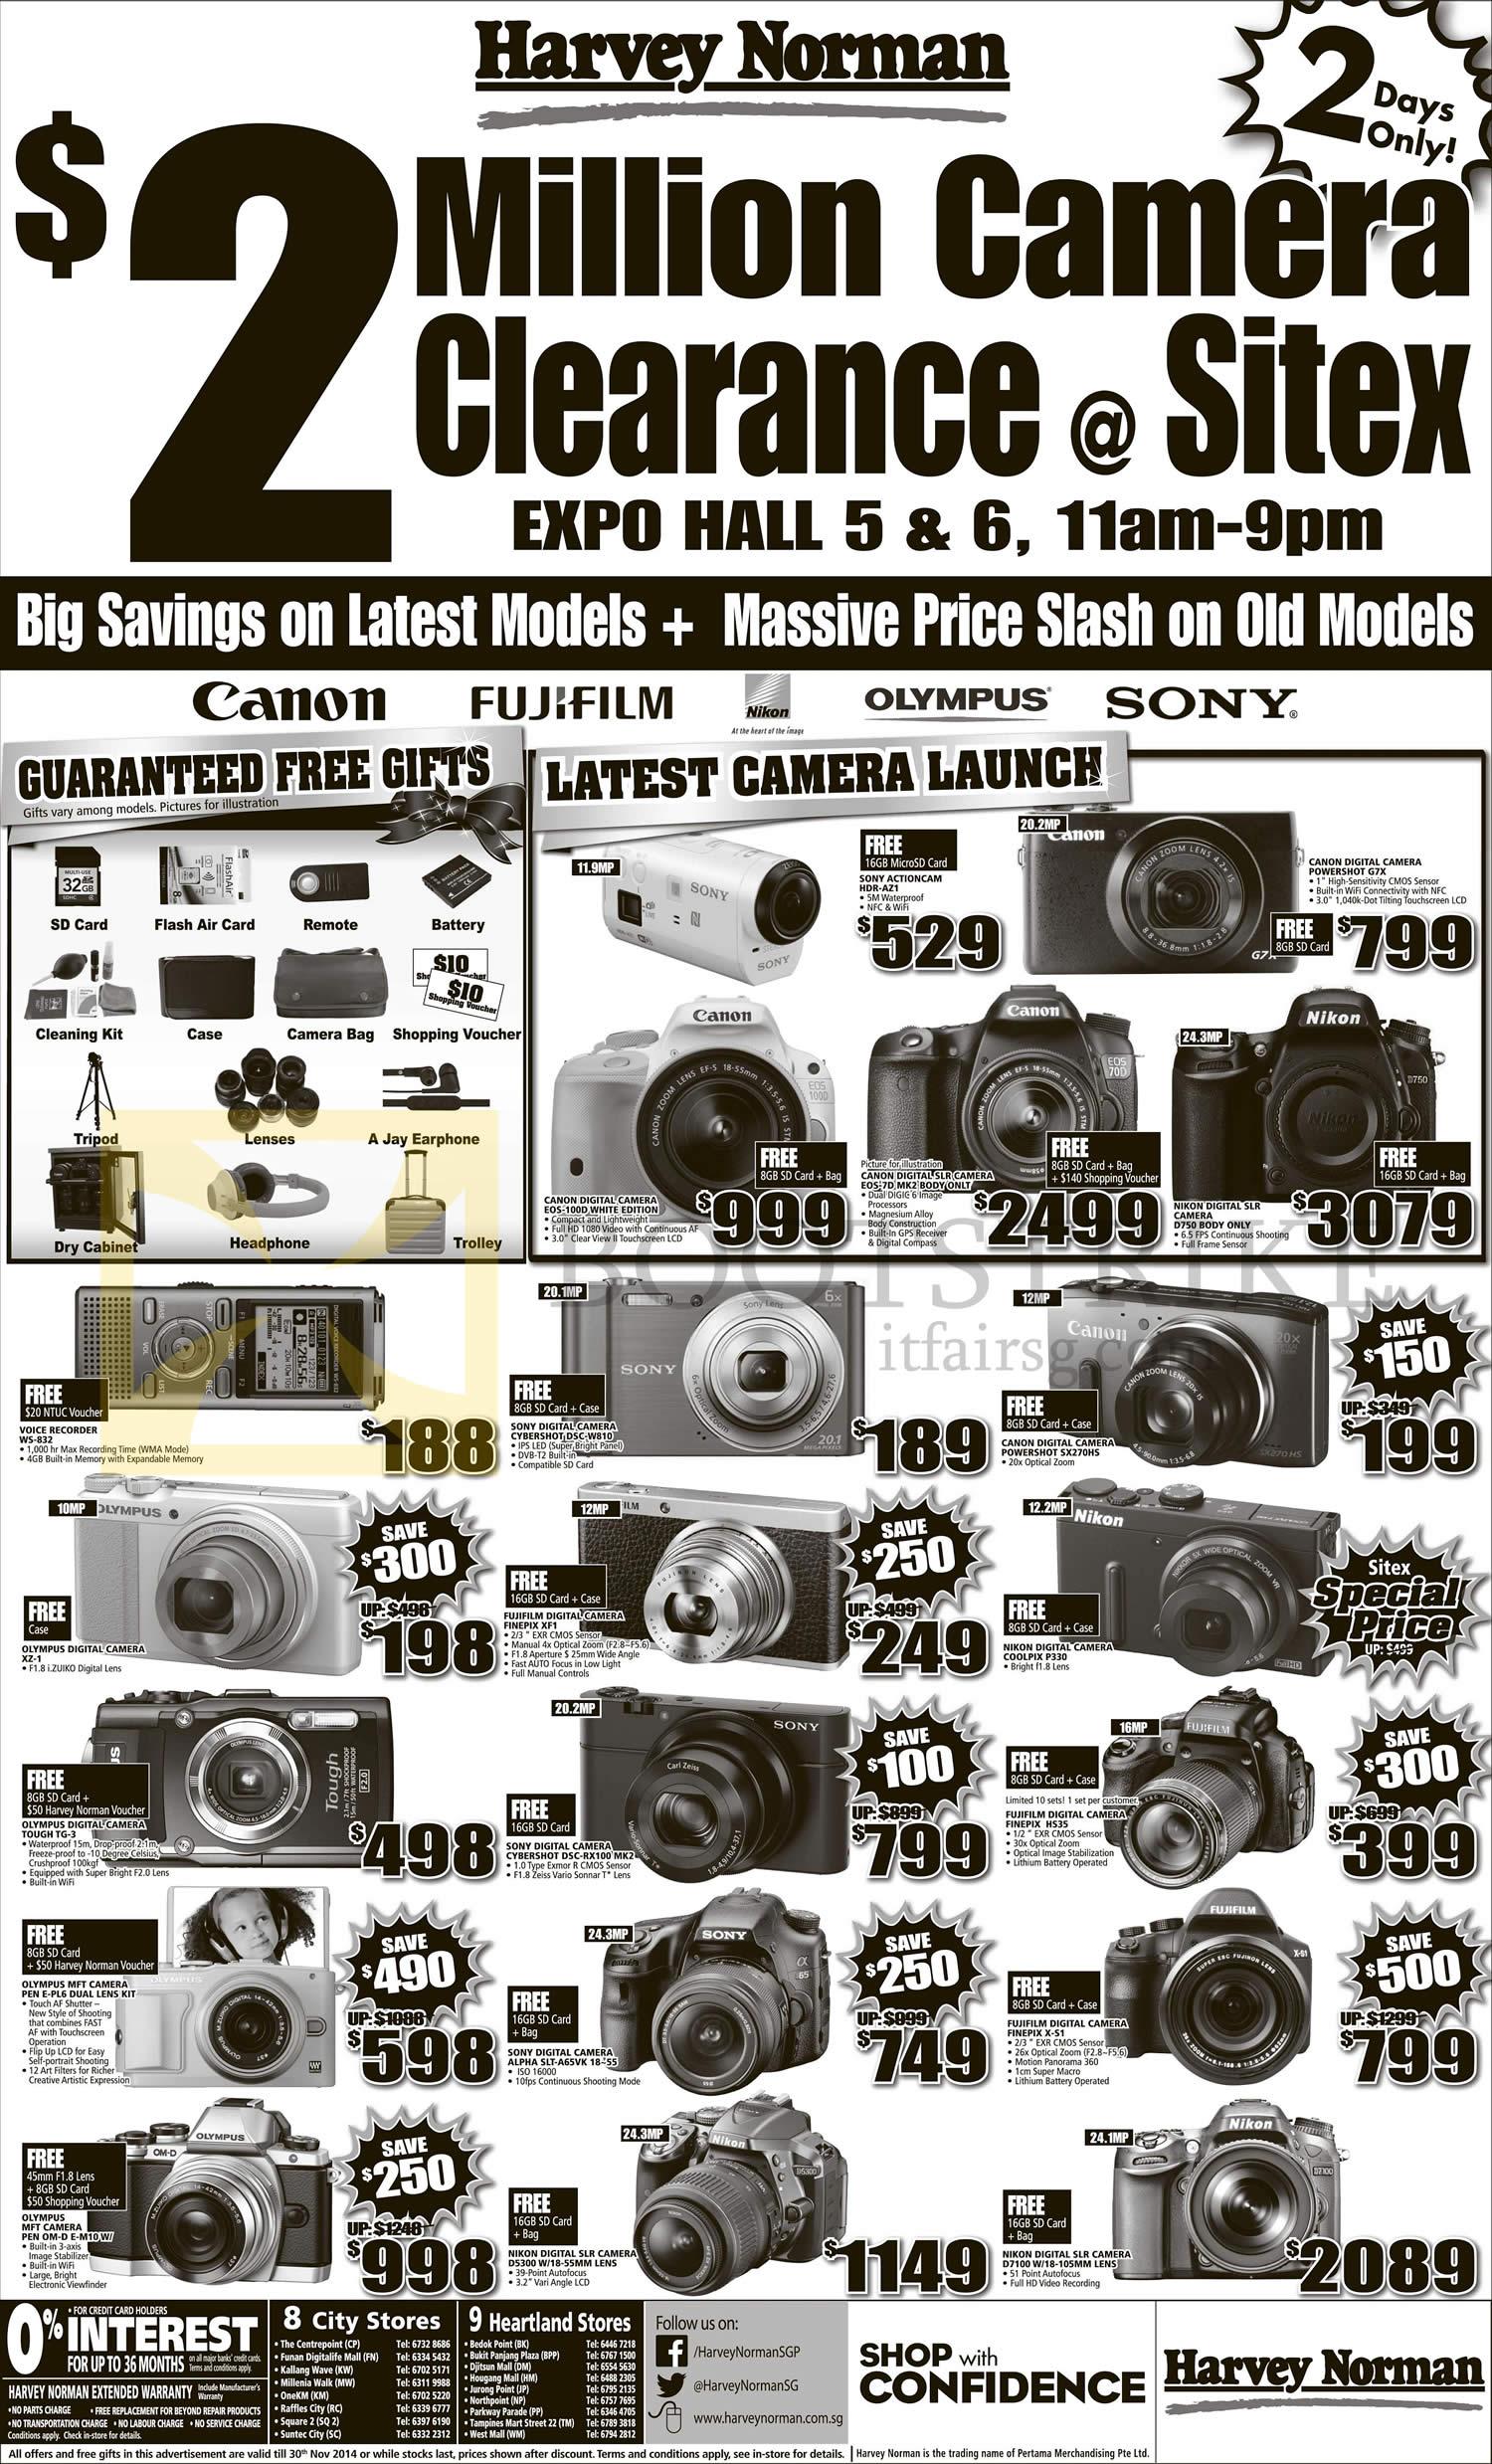 SITEX 2014 price list image brochure of Harvey Norman Digital Cameras, Camcorders, Sony, Canon, Nikon, Olympus, Fujifilm HS35, G7X, EOS 7D, D750, 100D, SX270HS, P330, XF1